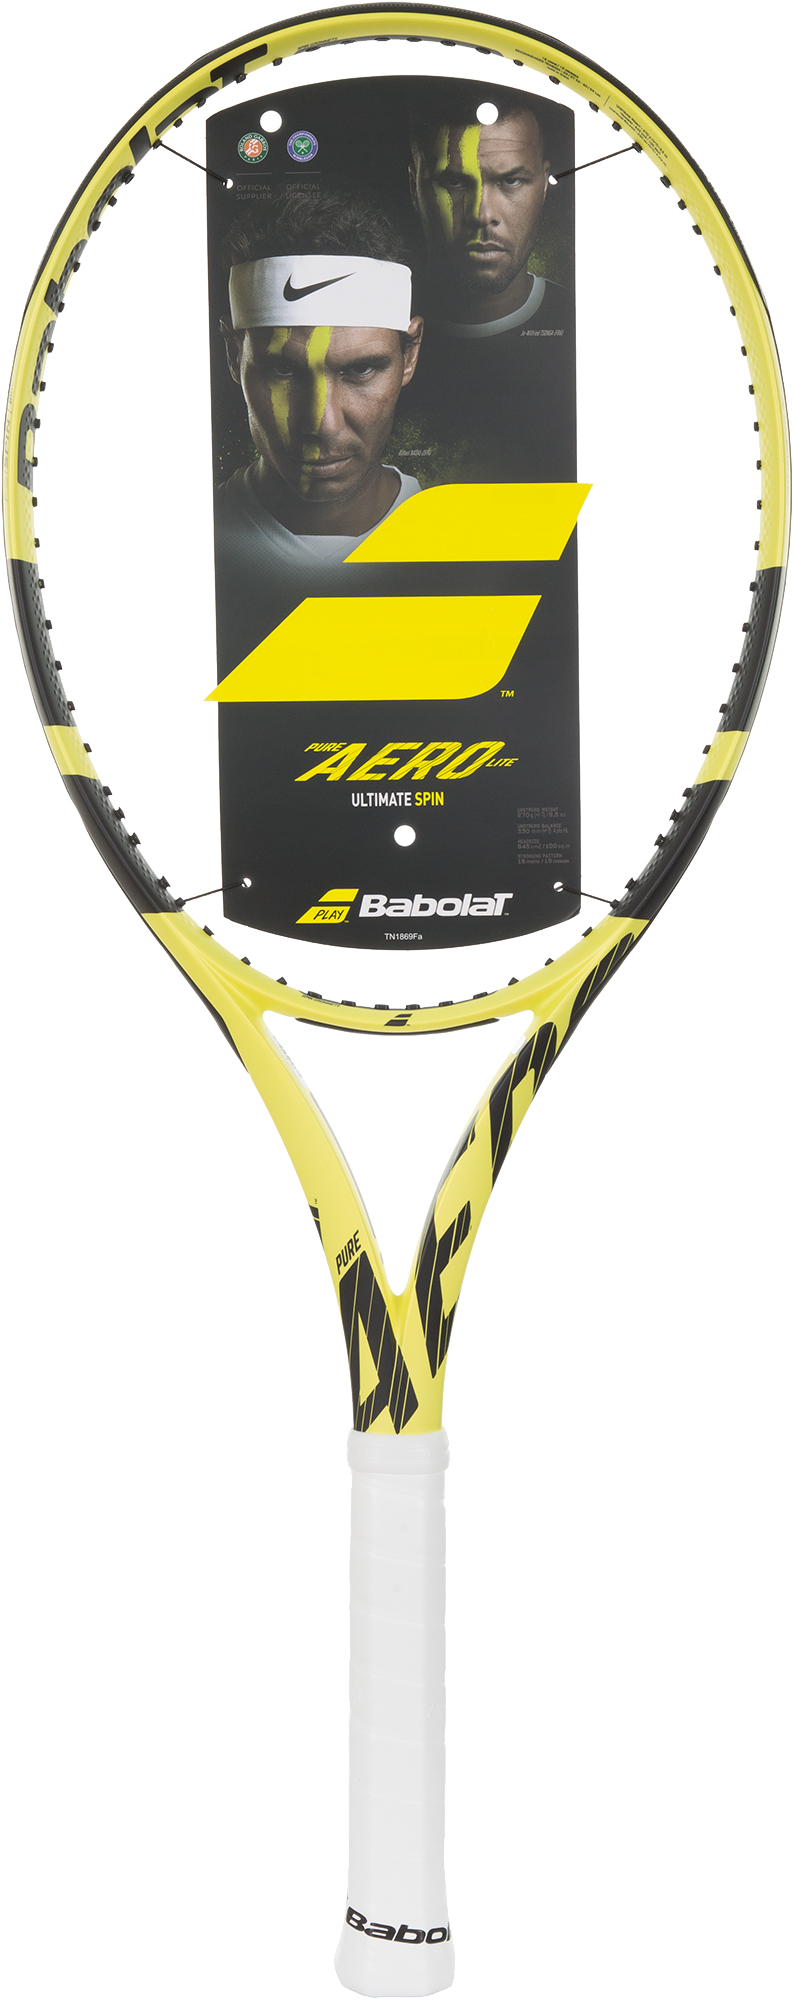 Babolat Ракетка для большого тенниса Babolat Pure Aero Lite babolat ракетка для большого тенниса детская babolat aero junior 25 размер без размера